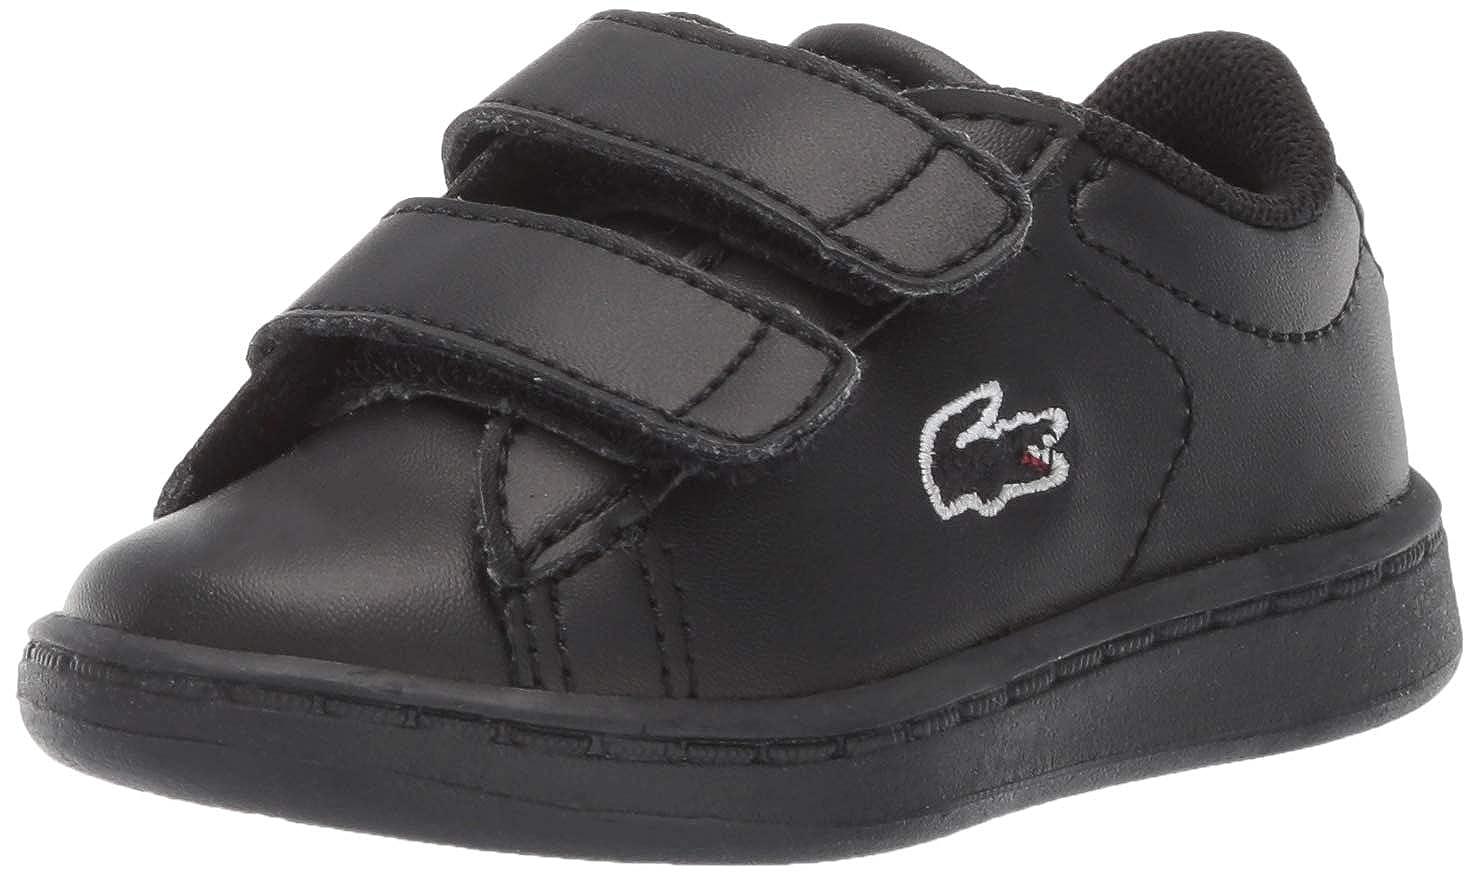 Medium US Toddler 9.5 Lacoste Baby Carnaby EVO Sneaker Black